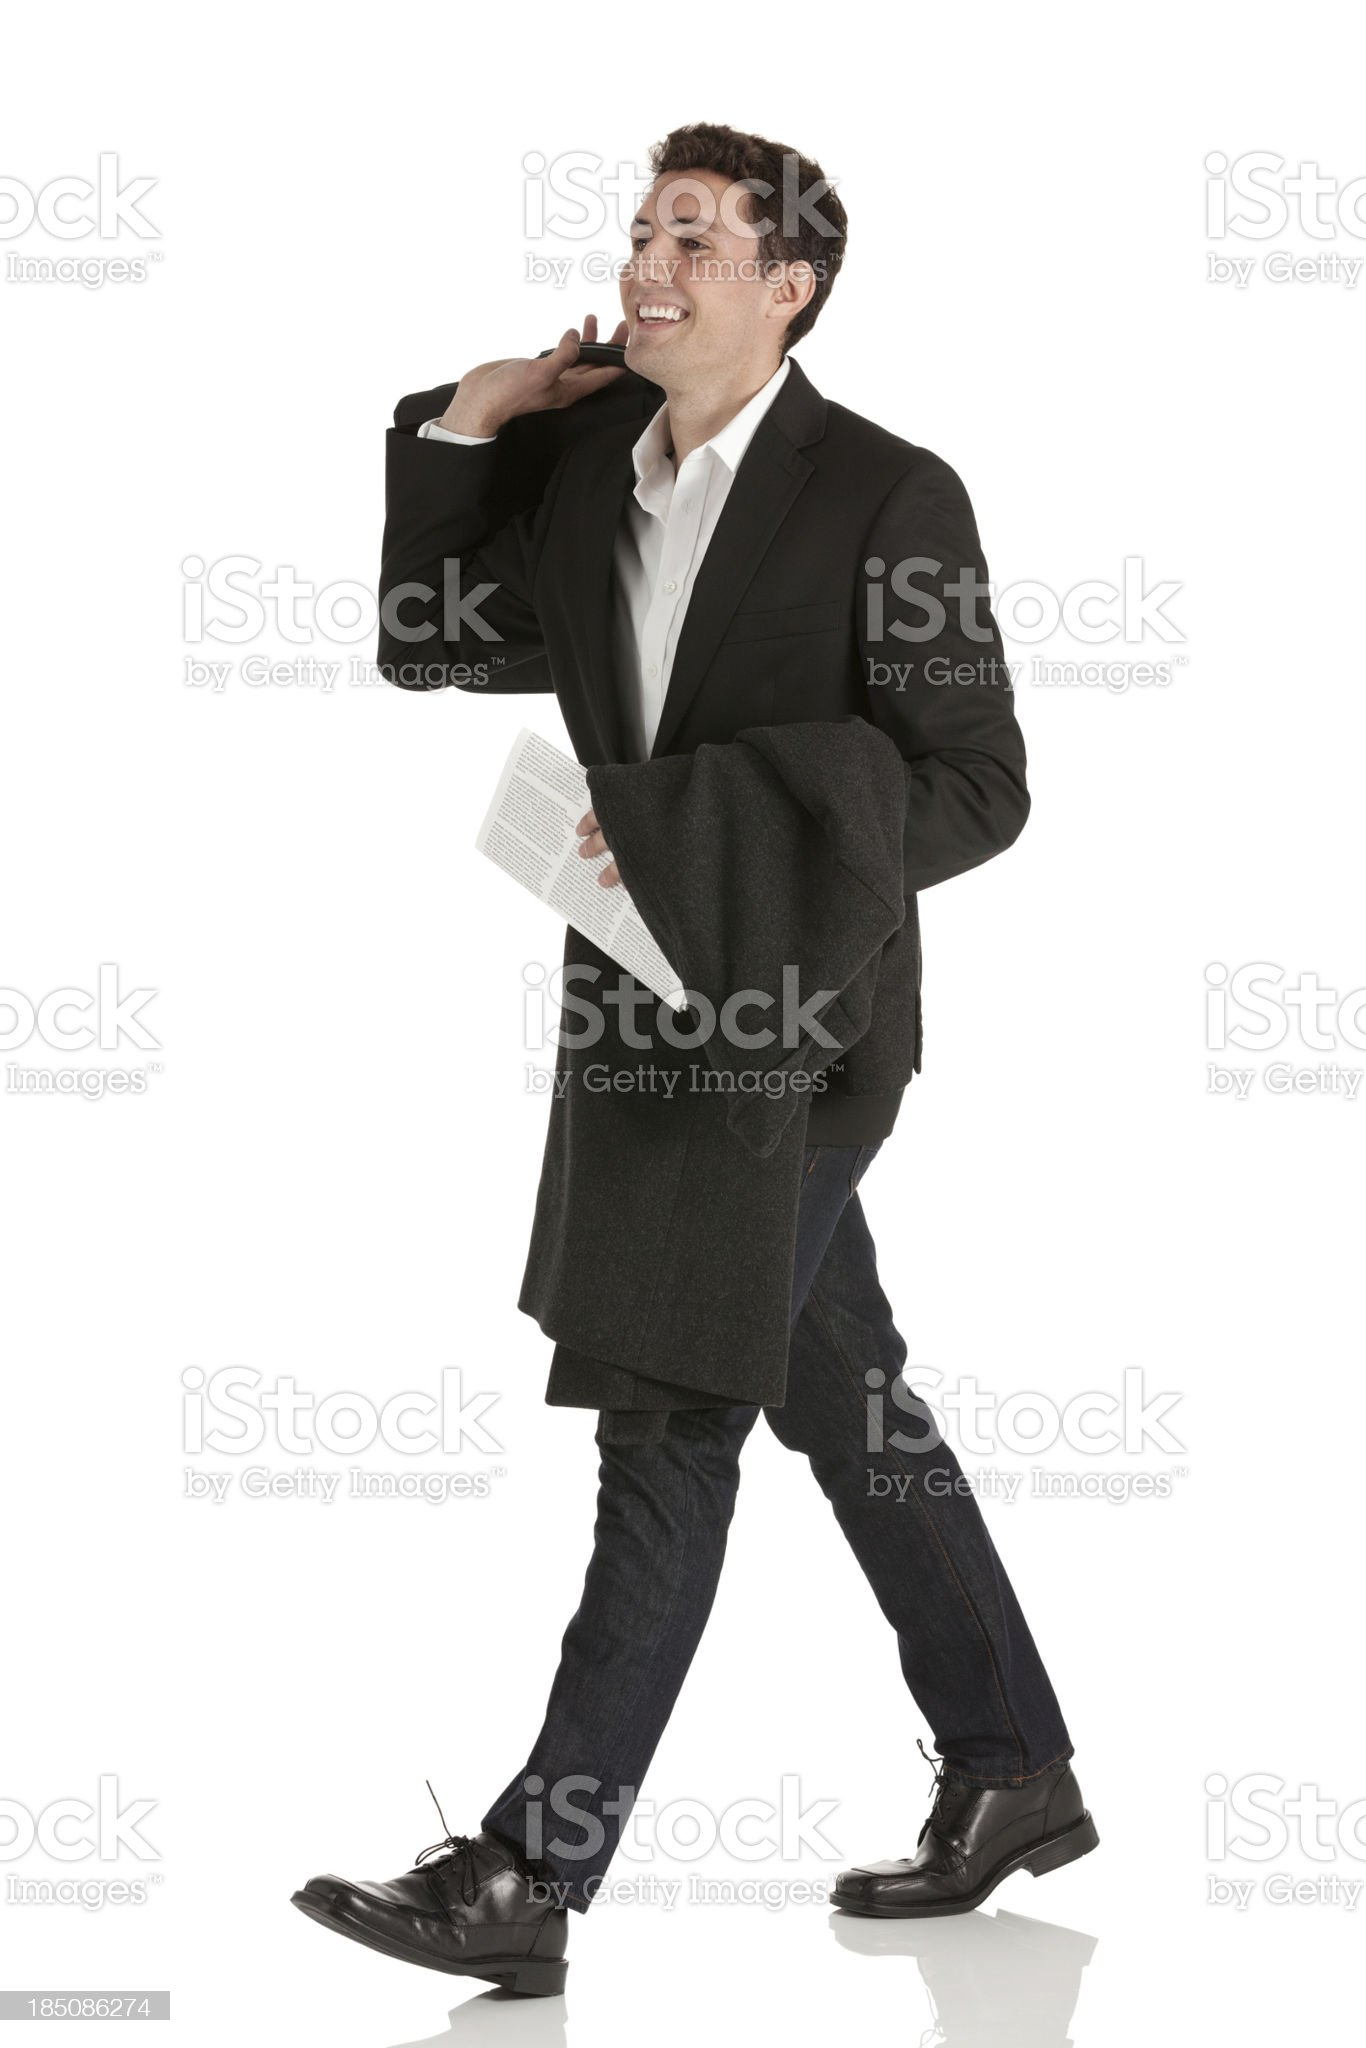 Happy businessman walking royalty-free stock photo